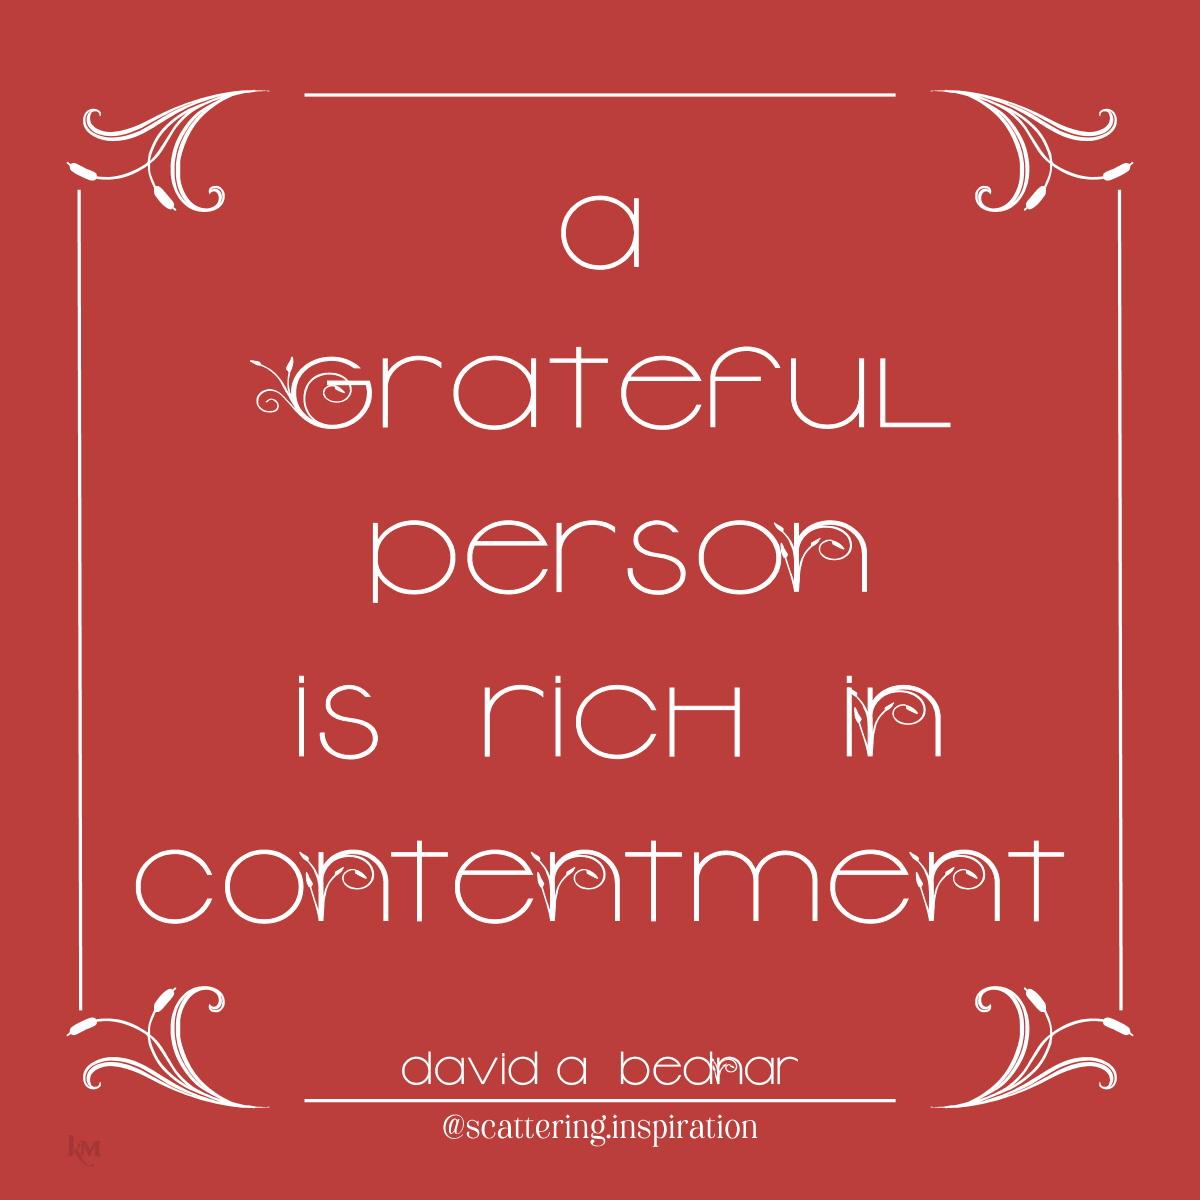 grateful contentment